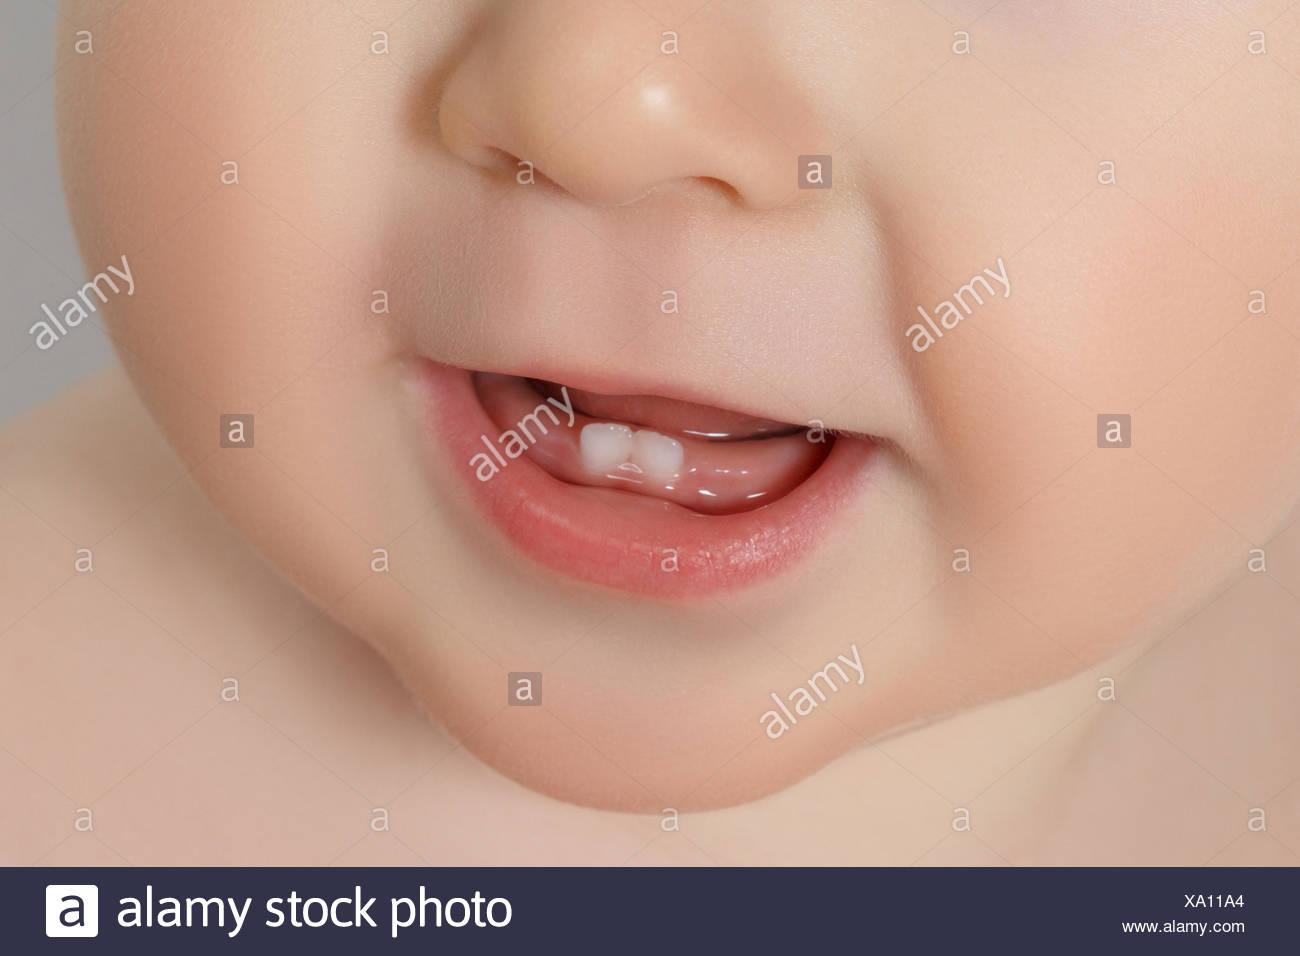 closeup of a Baby teeth Stock Photo